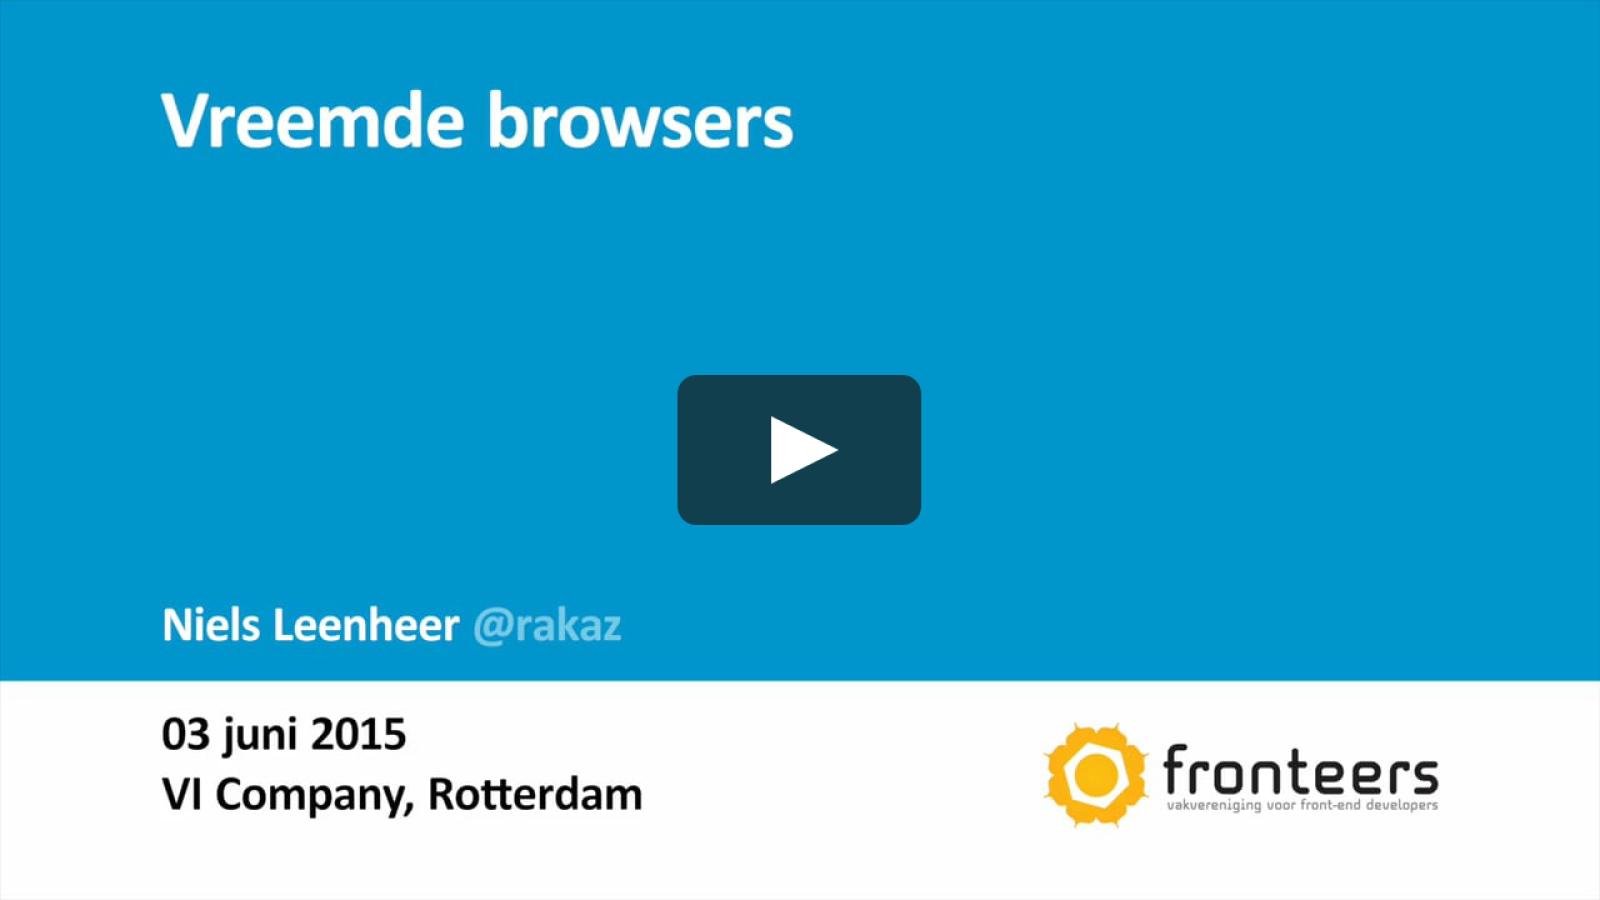 Vreemde Browsers